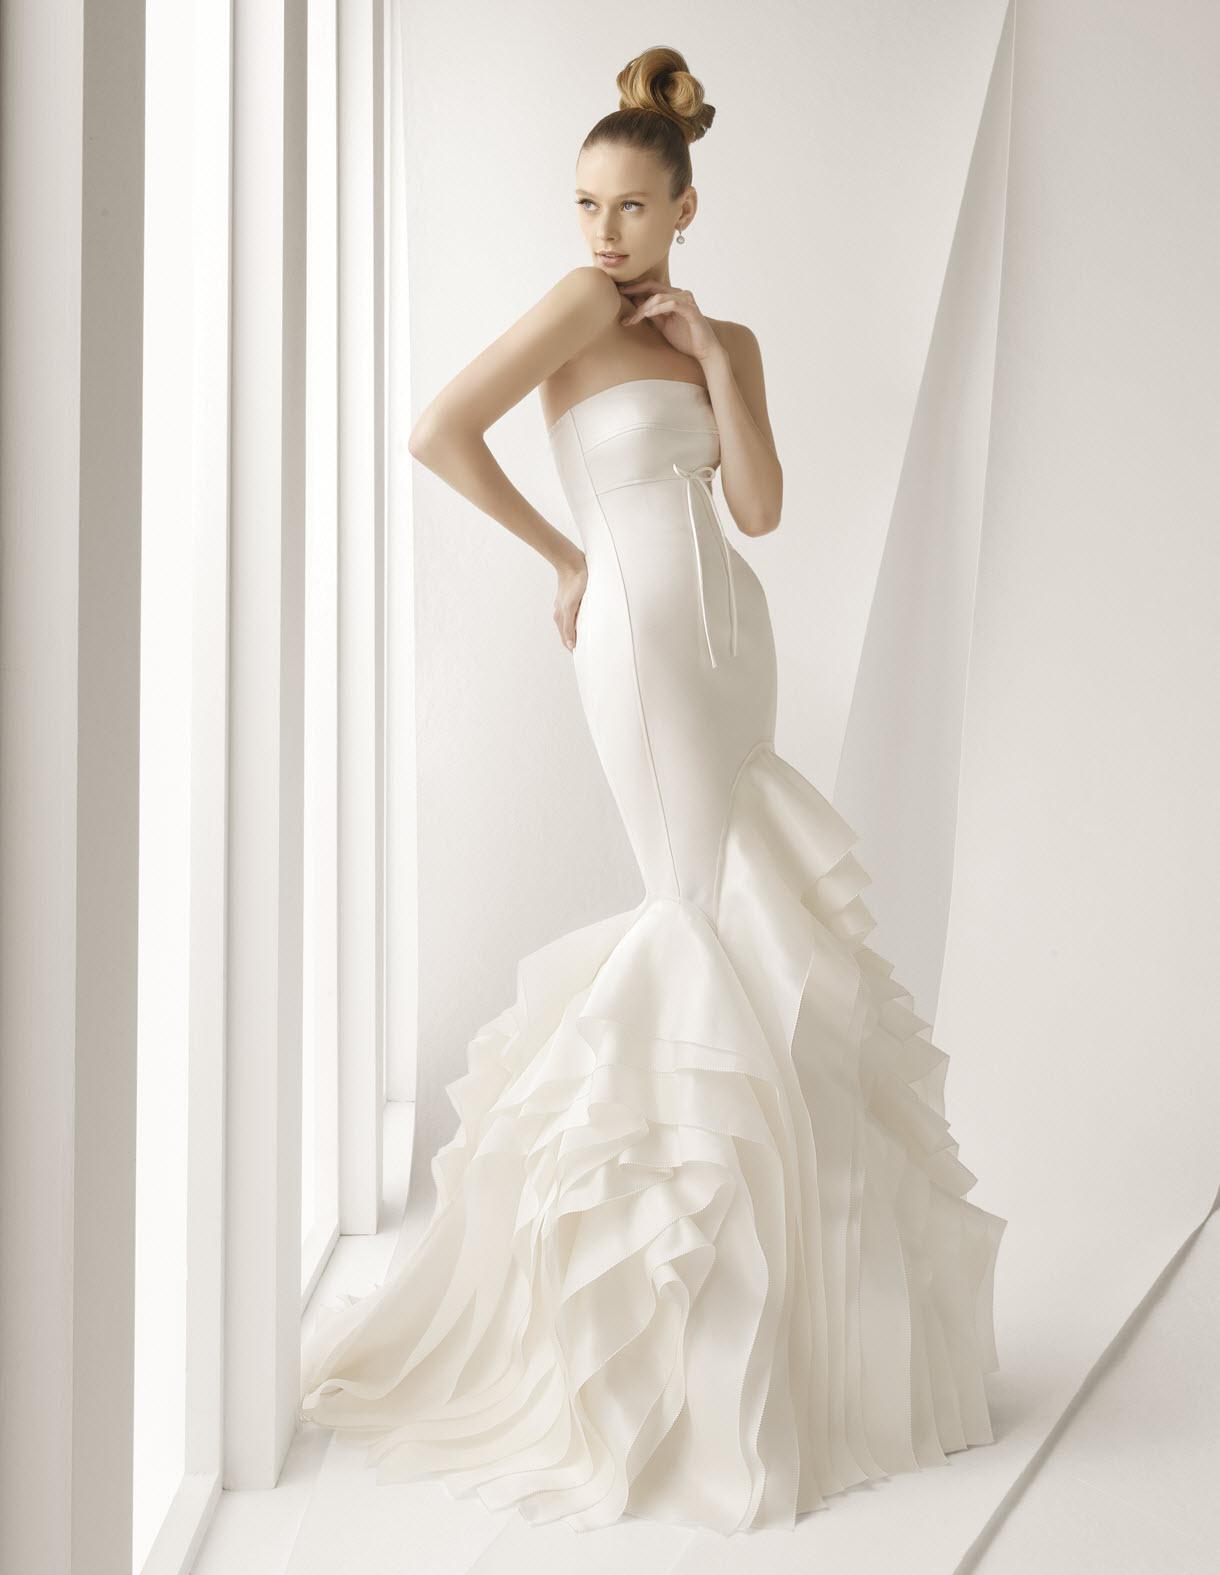 Stunning ivory strapless mermaid wedding dress with